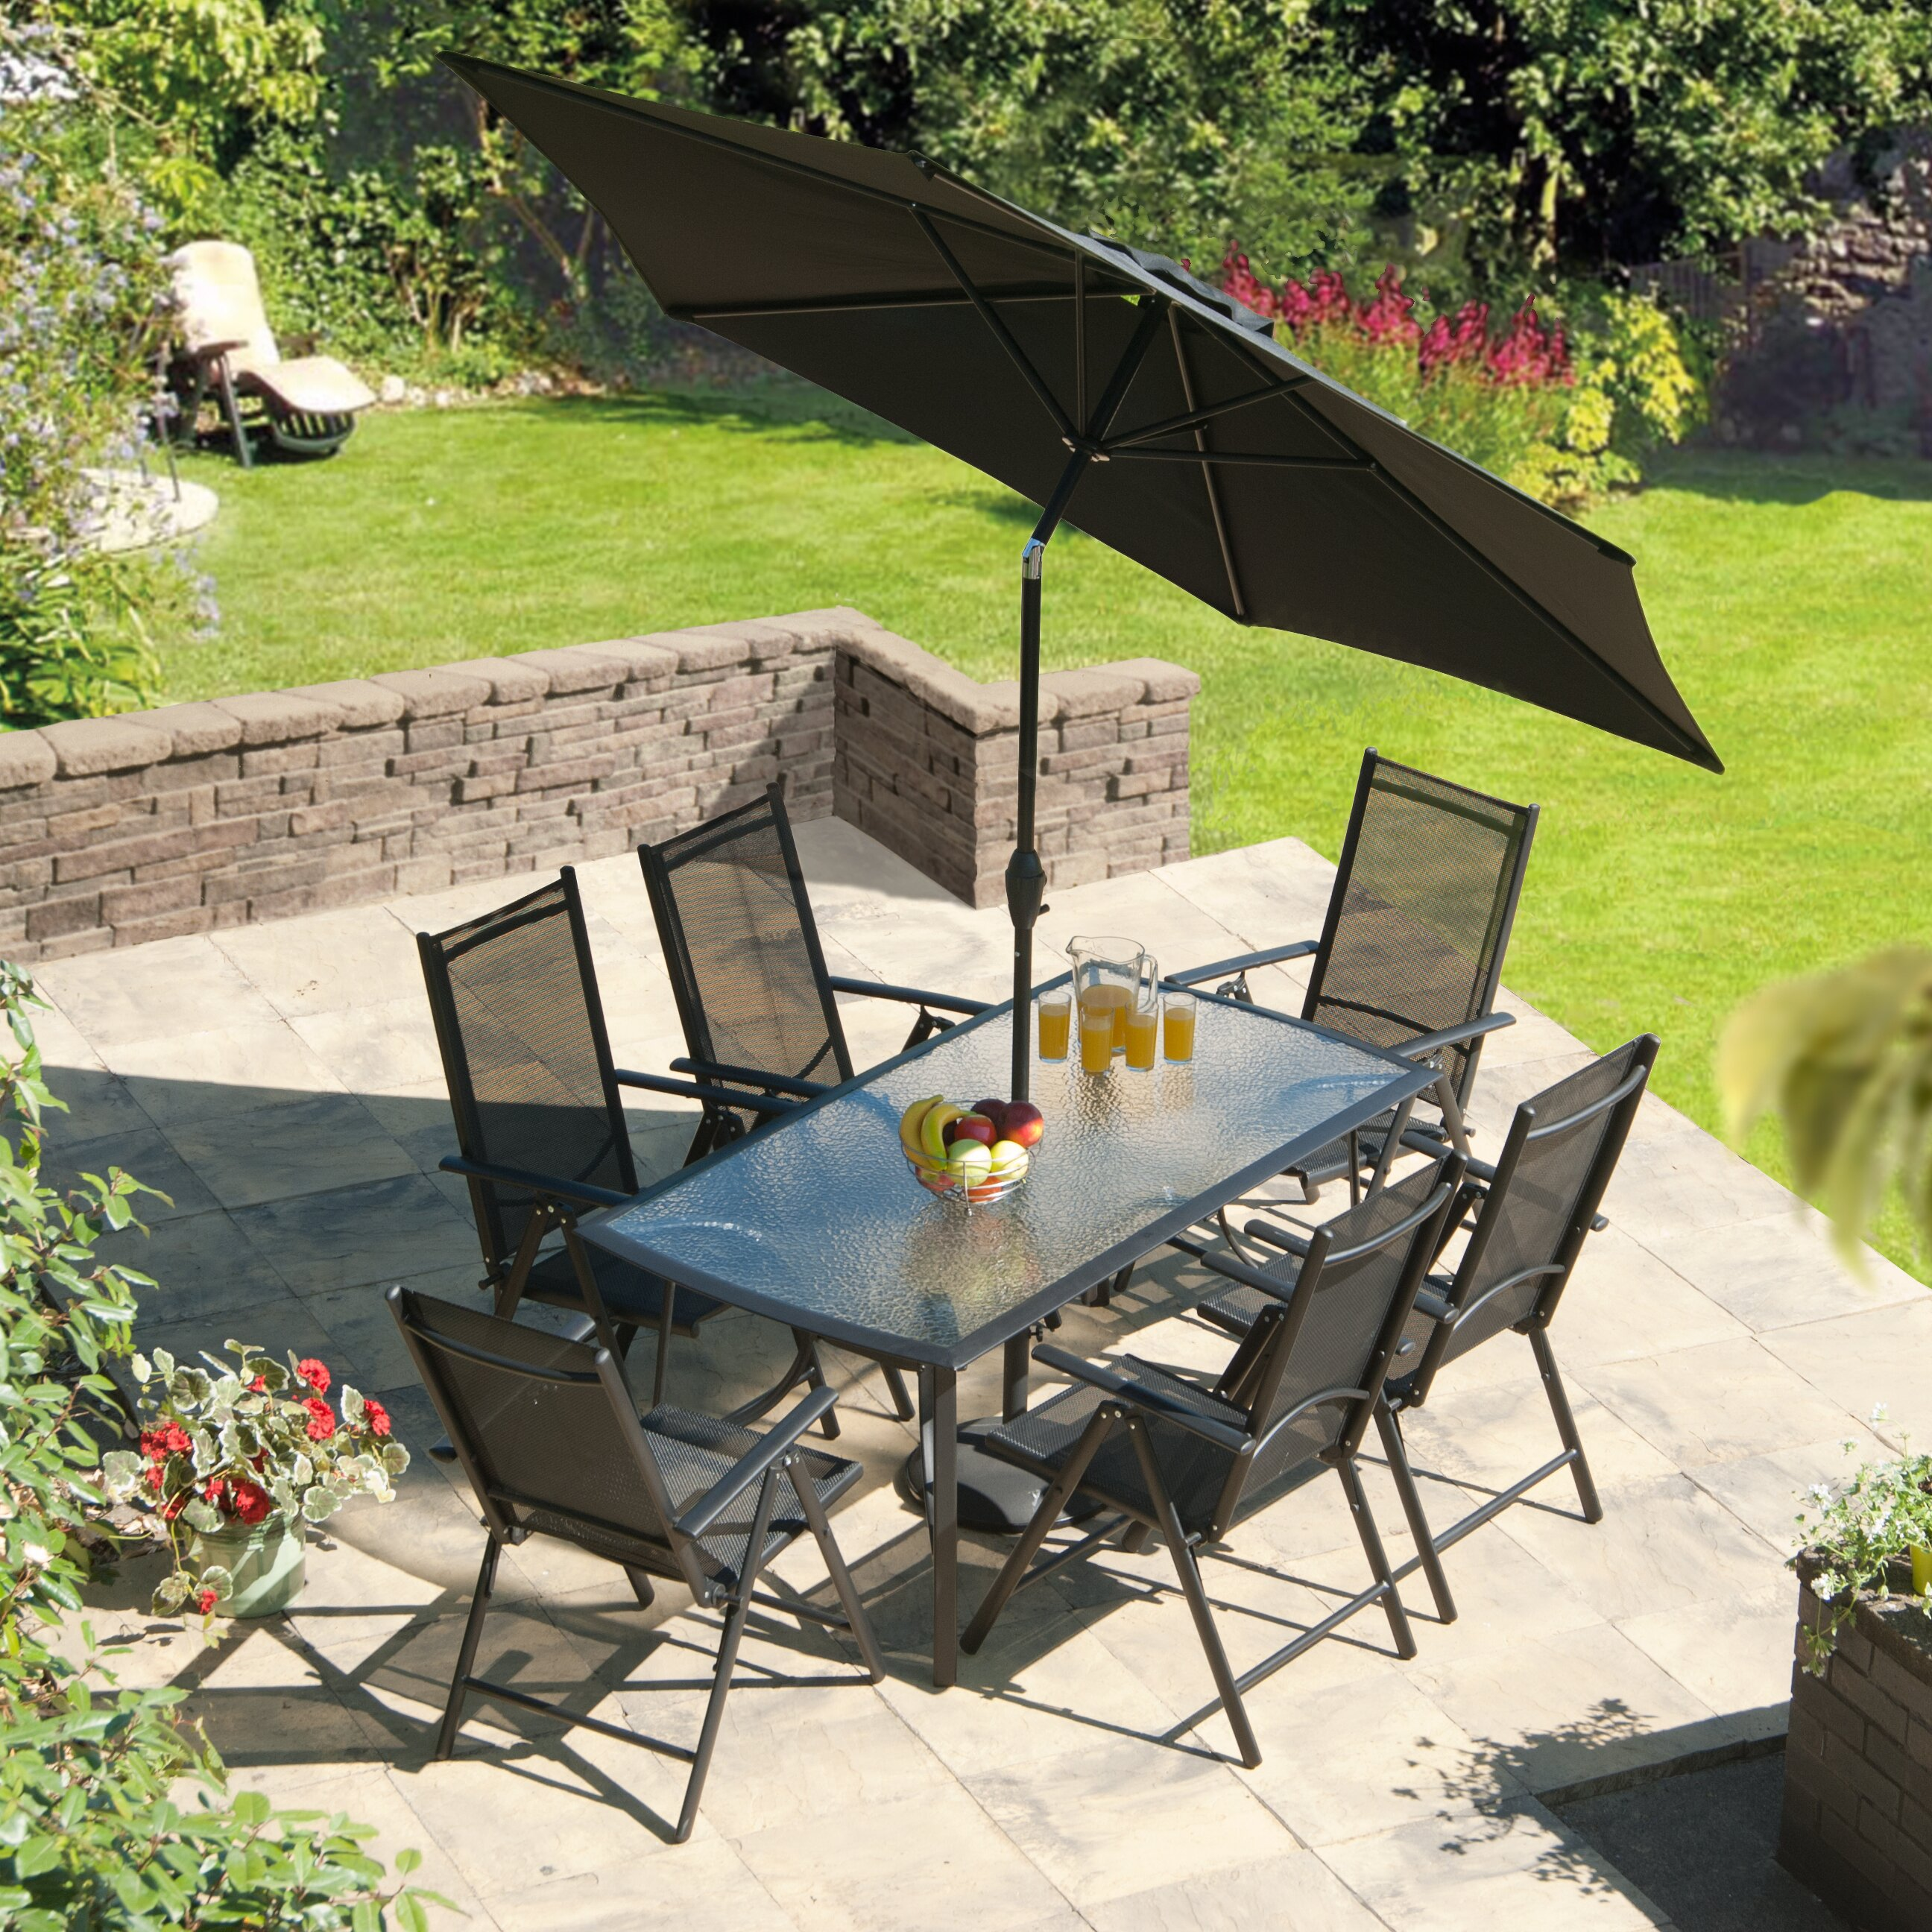 SunTime Outdoor Living Capri 8 Piece Dining Set & Reviews ... on Suntime Outdoor Living id=42613